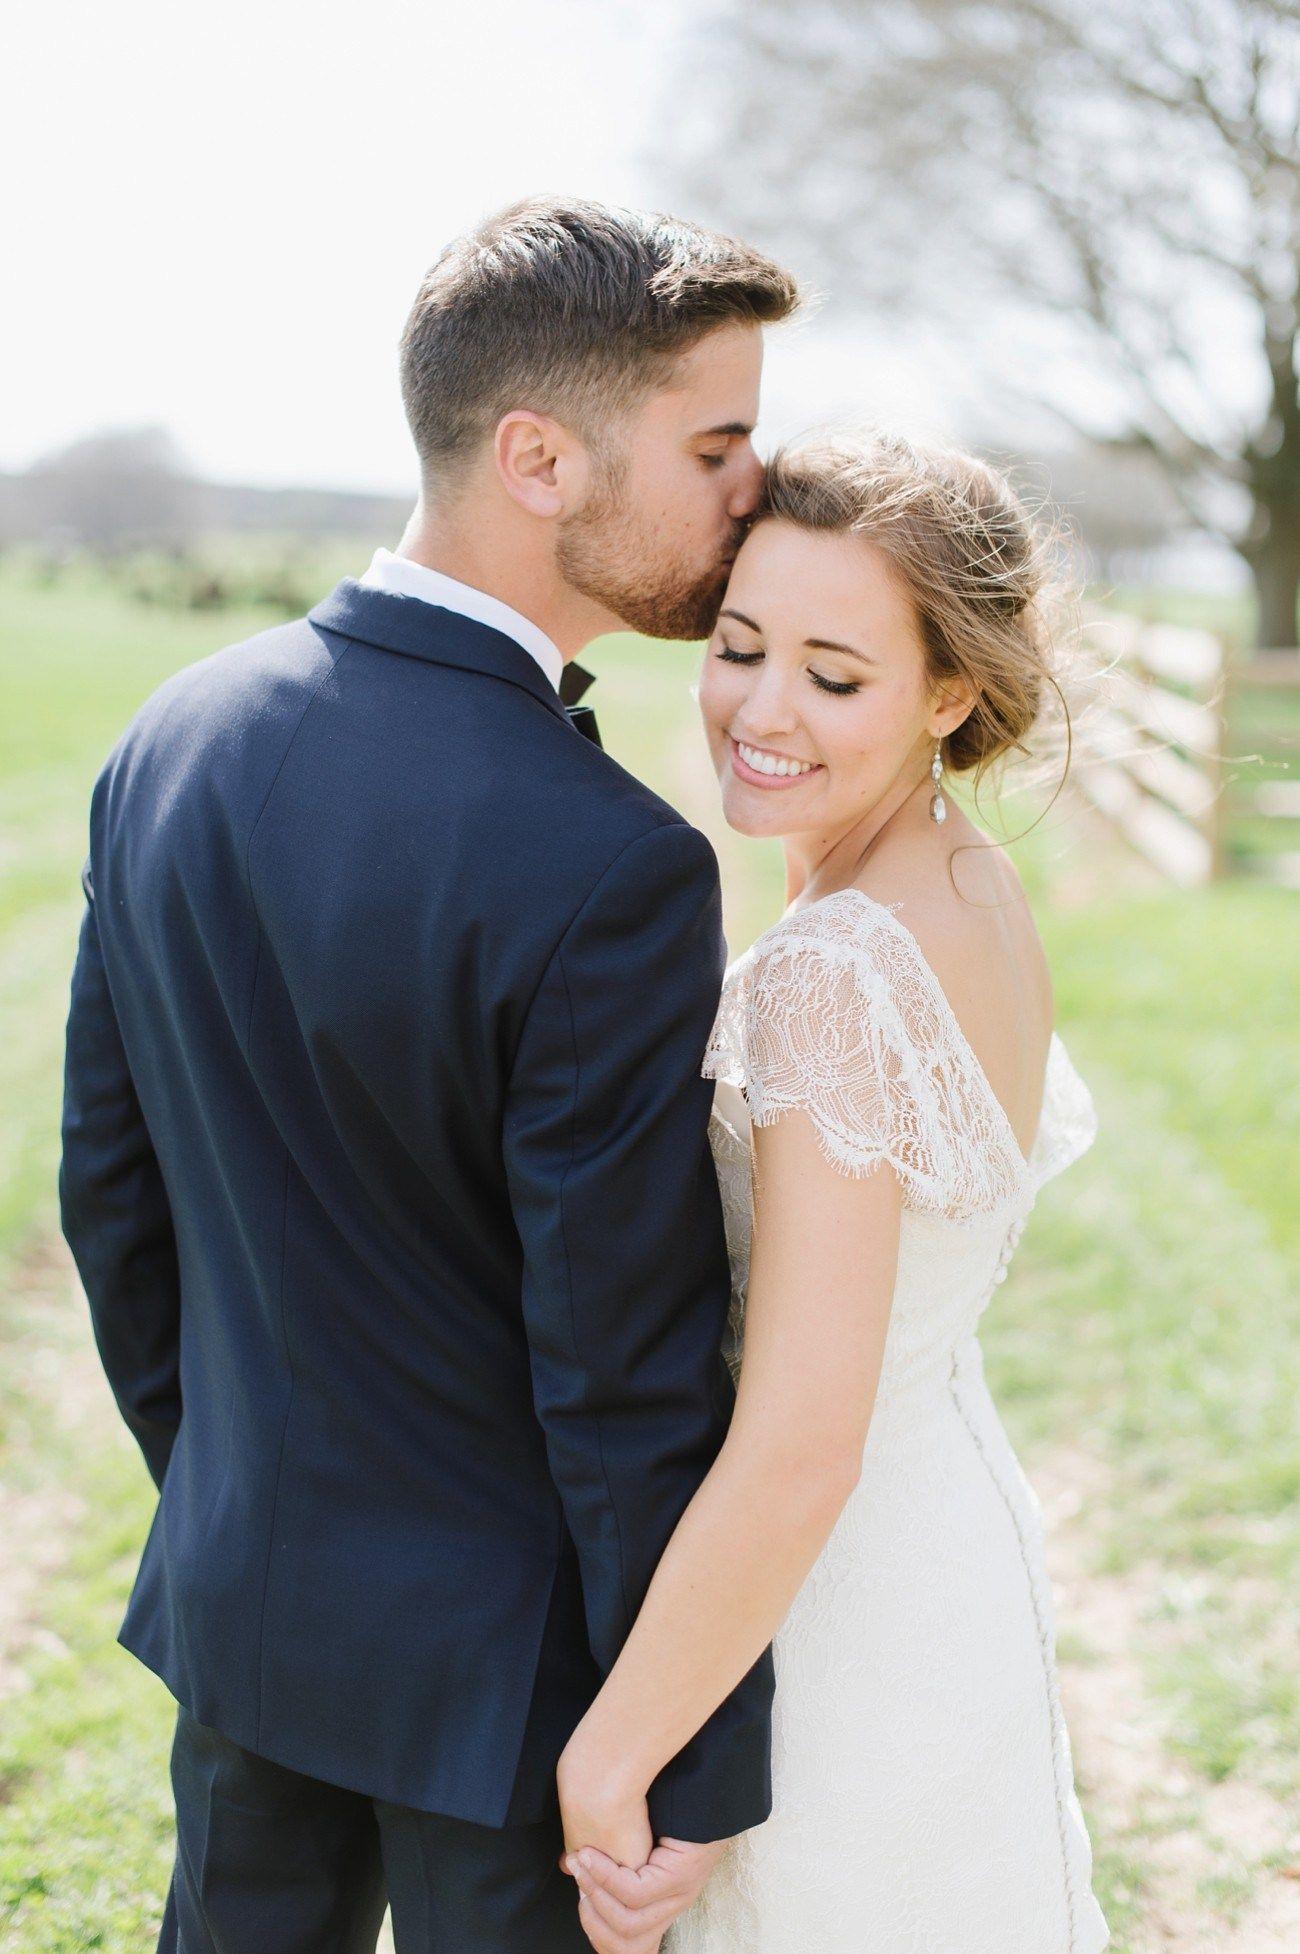 Outdoor Wedding Photography Ideas 82 Weddingphotography